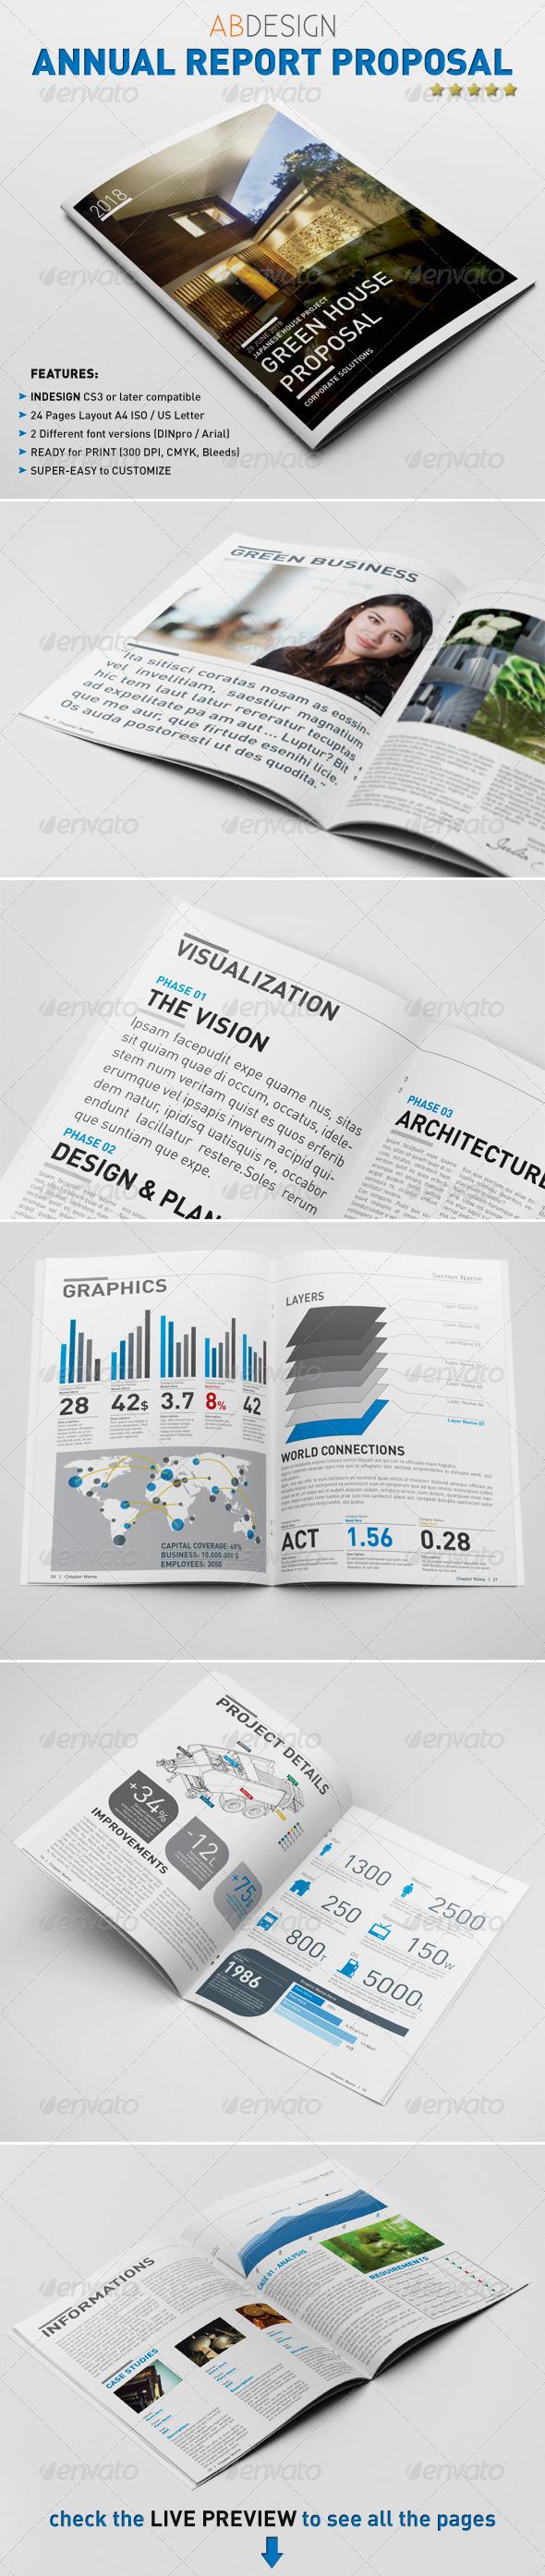 GraphicRiver Annual Report Proposal Template 1046119